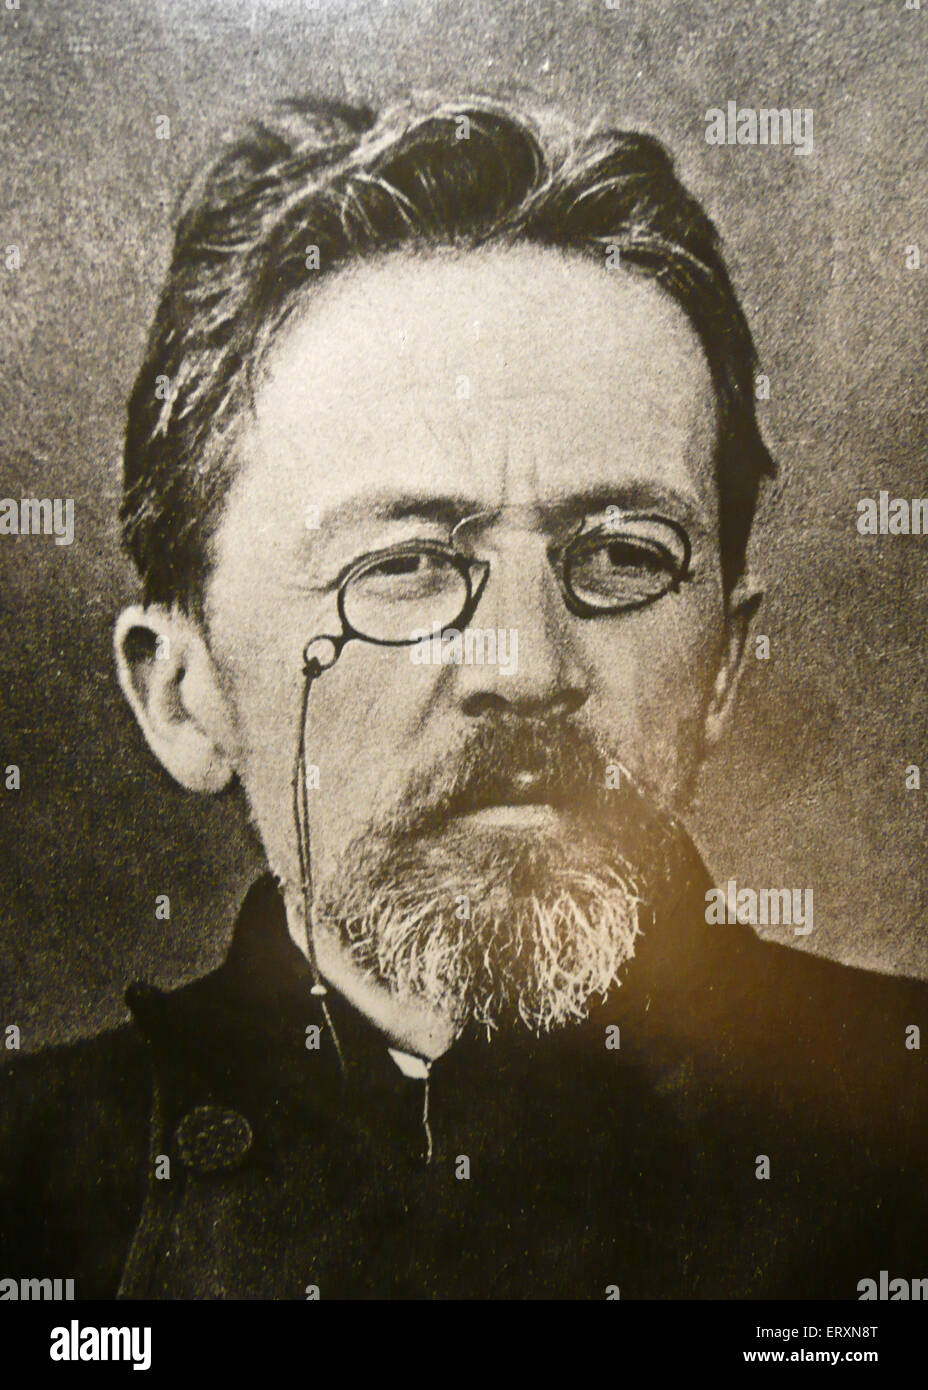 Anton Pavlovich Chekhov - 8 rules for educated person 46